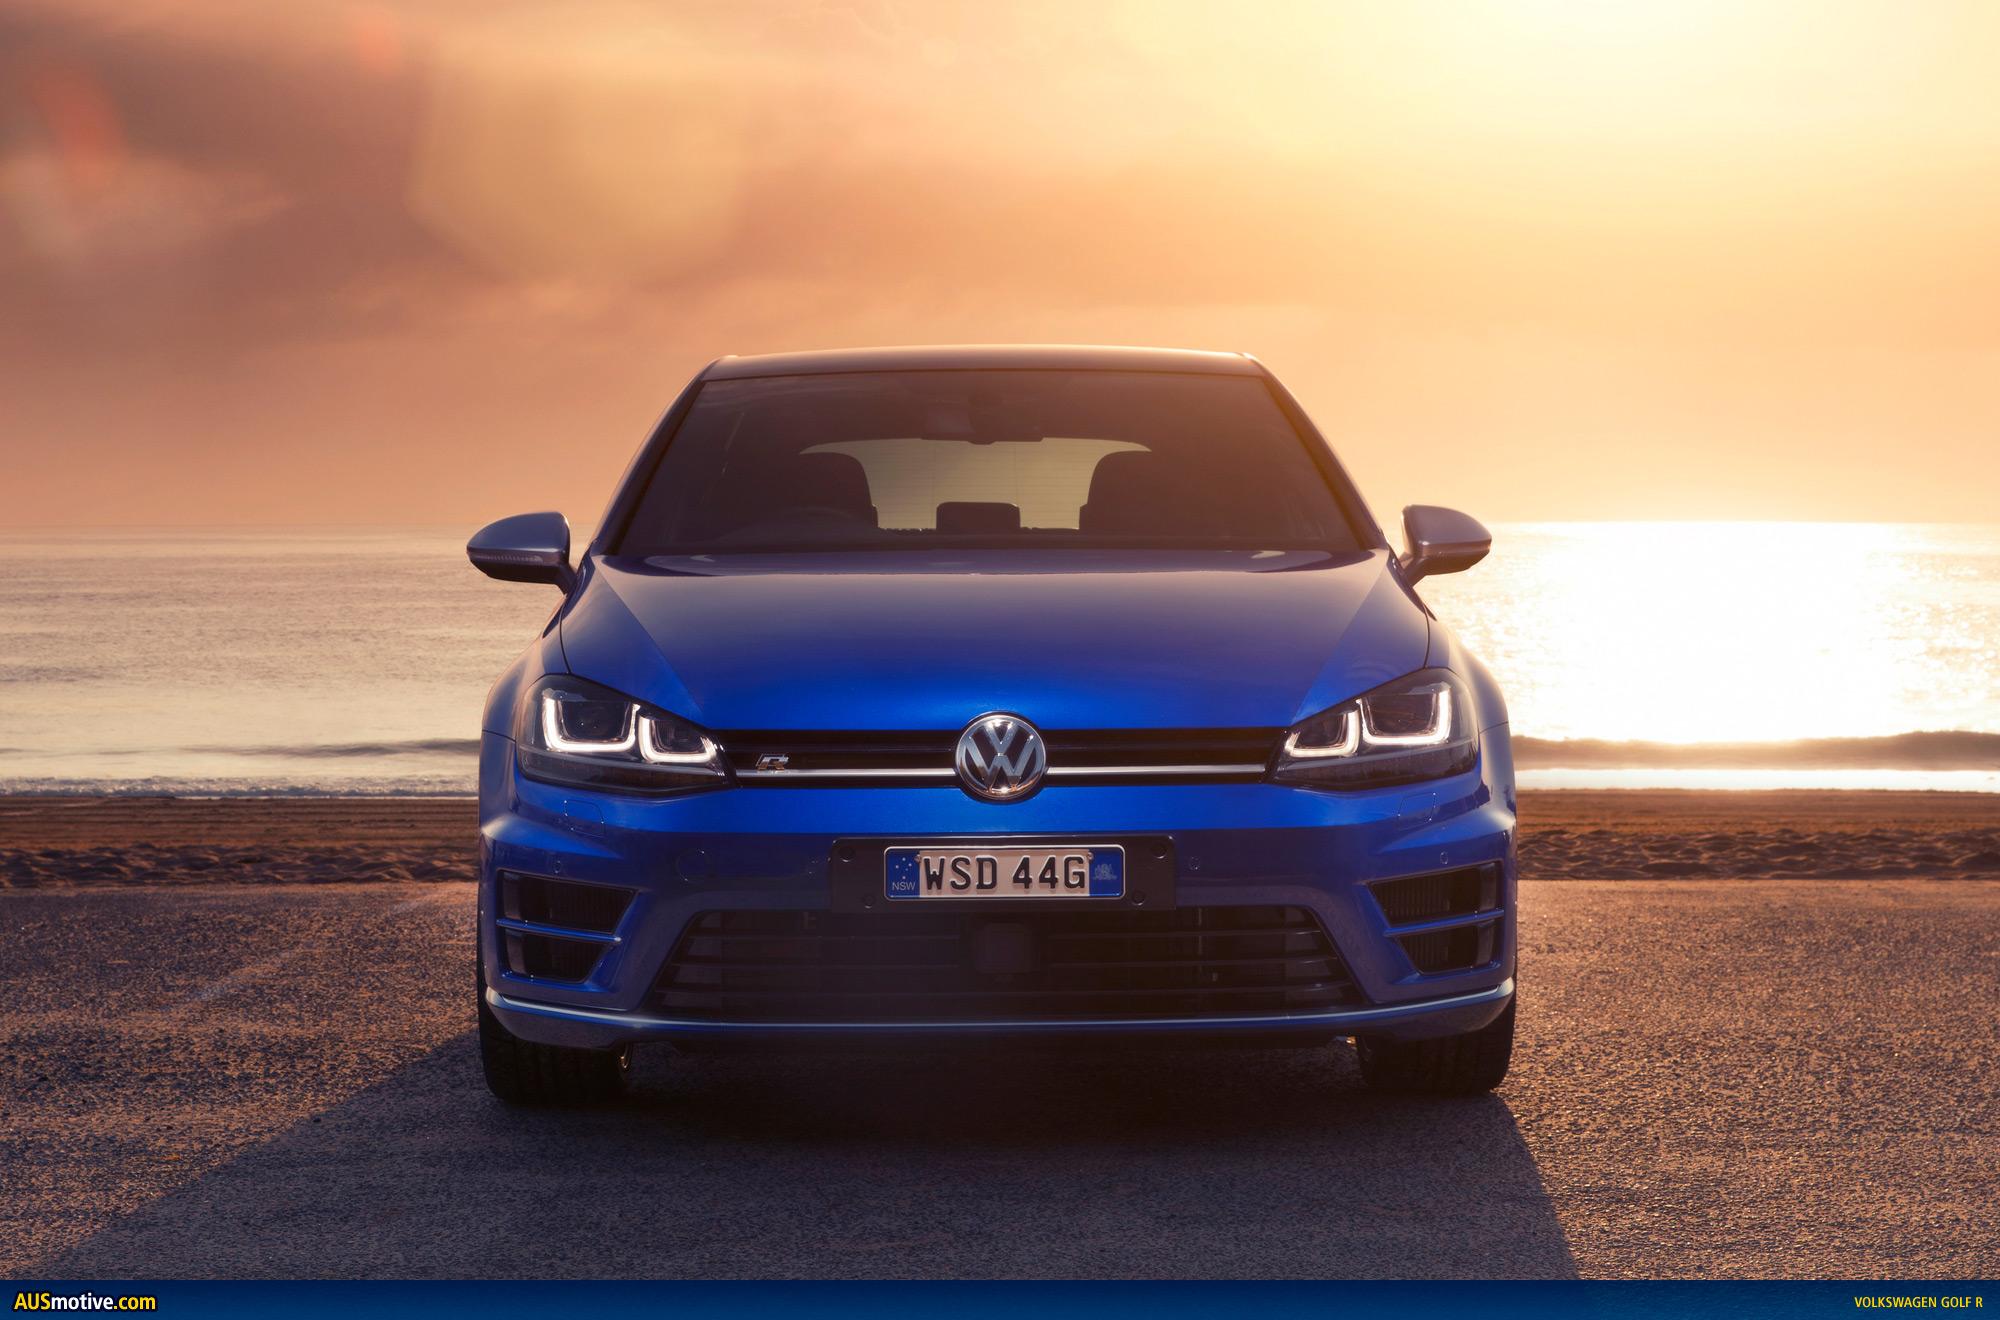 2014 Volkswagen Golf R Photo Wallpaper CarsWallpaperNet 2000x1320